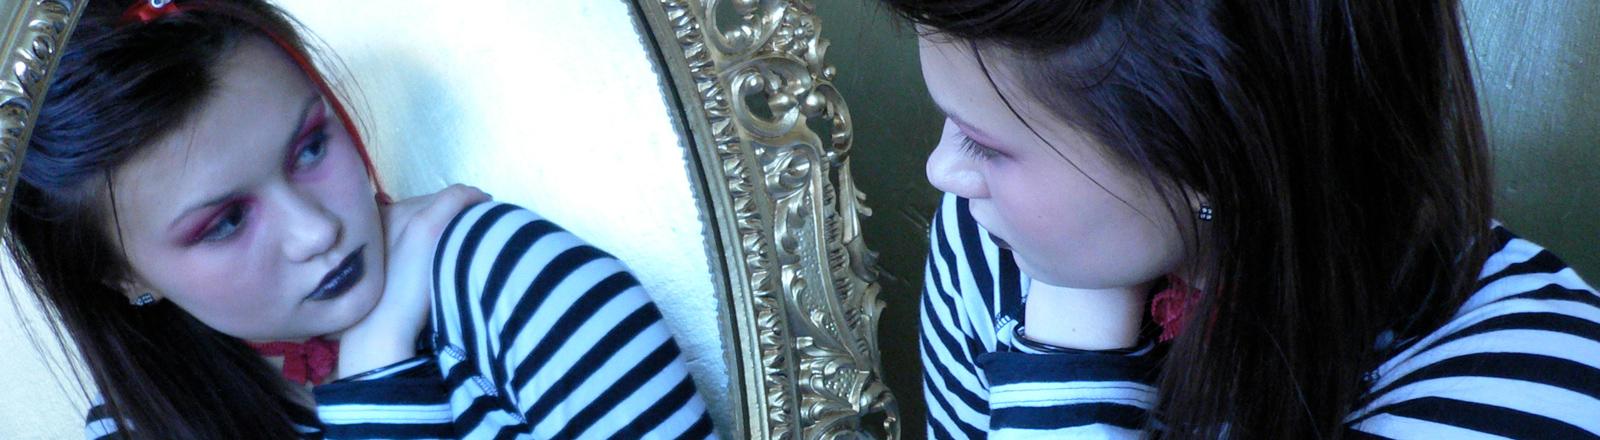 Frau blickt in den Spiegel